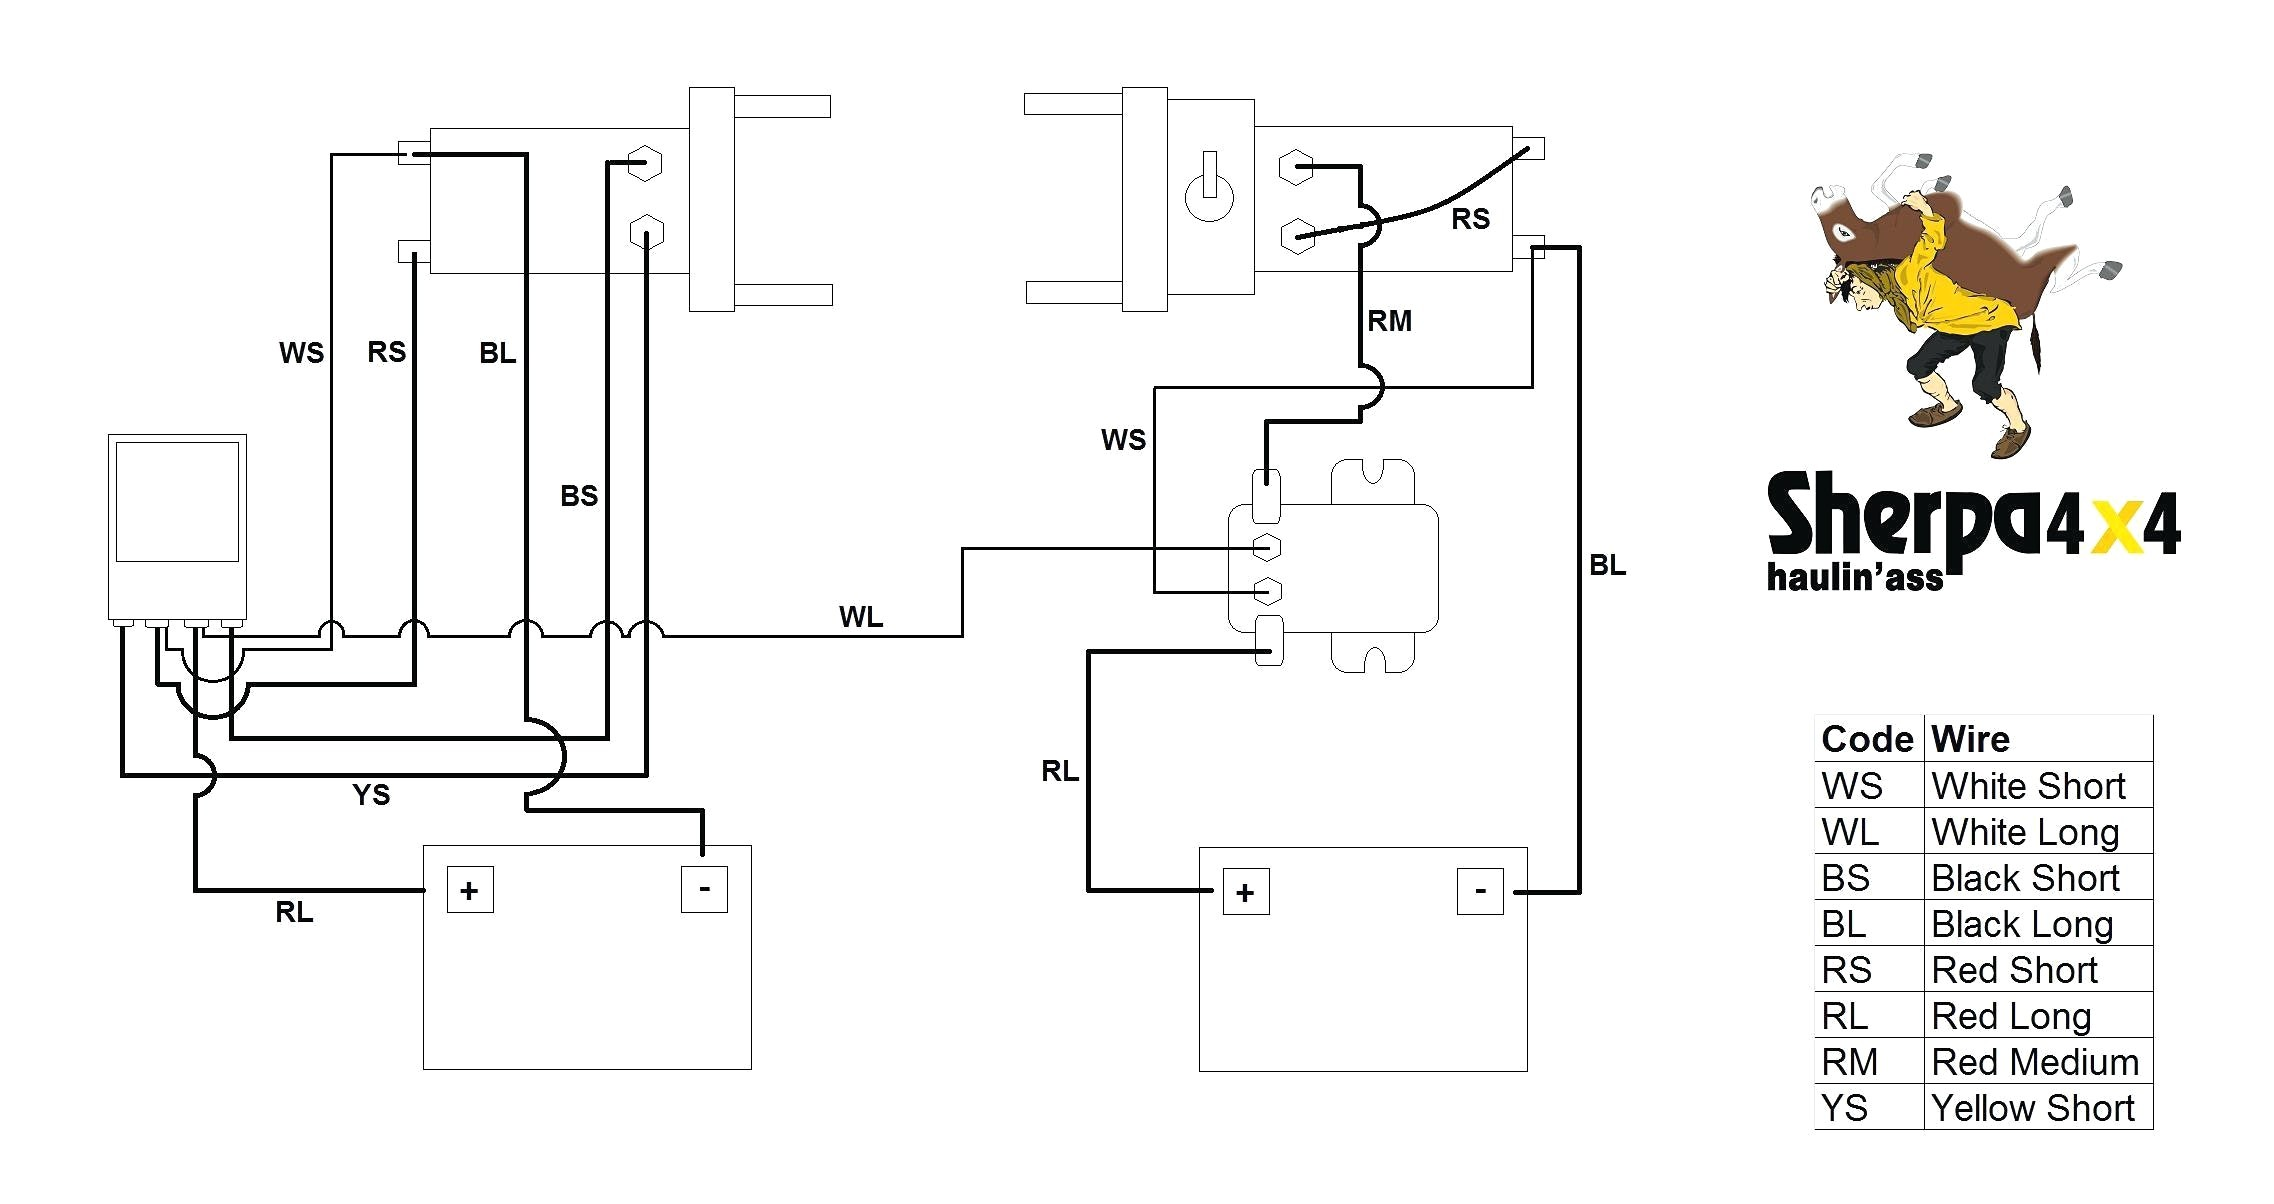 Wiring Diagram For Warn Winch